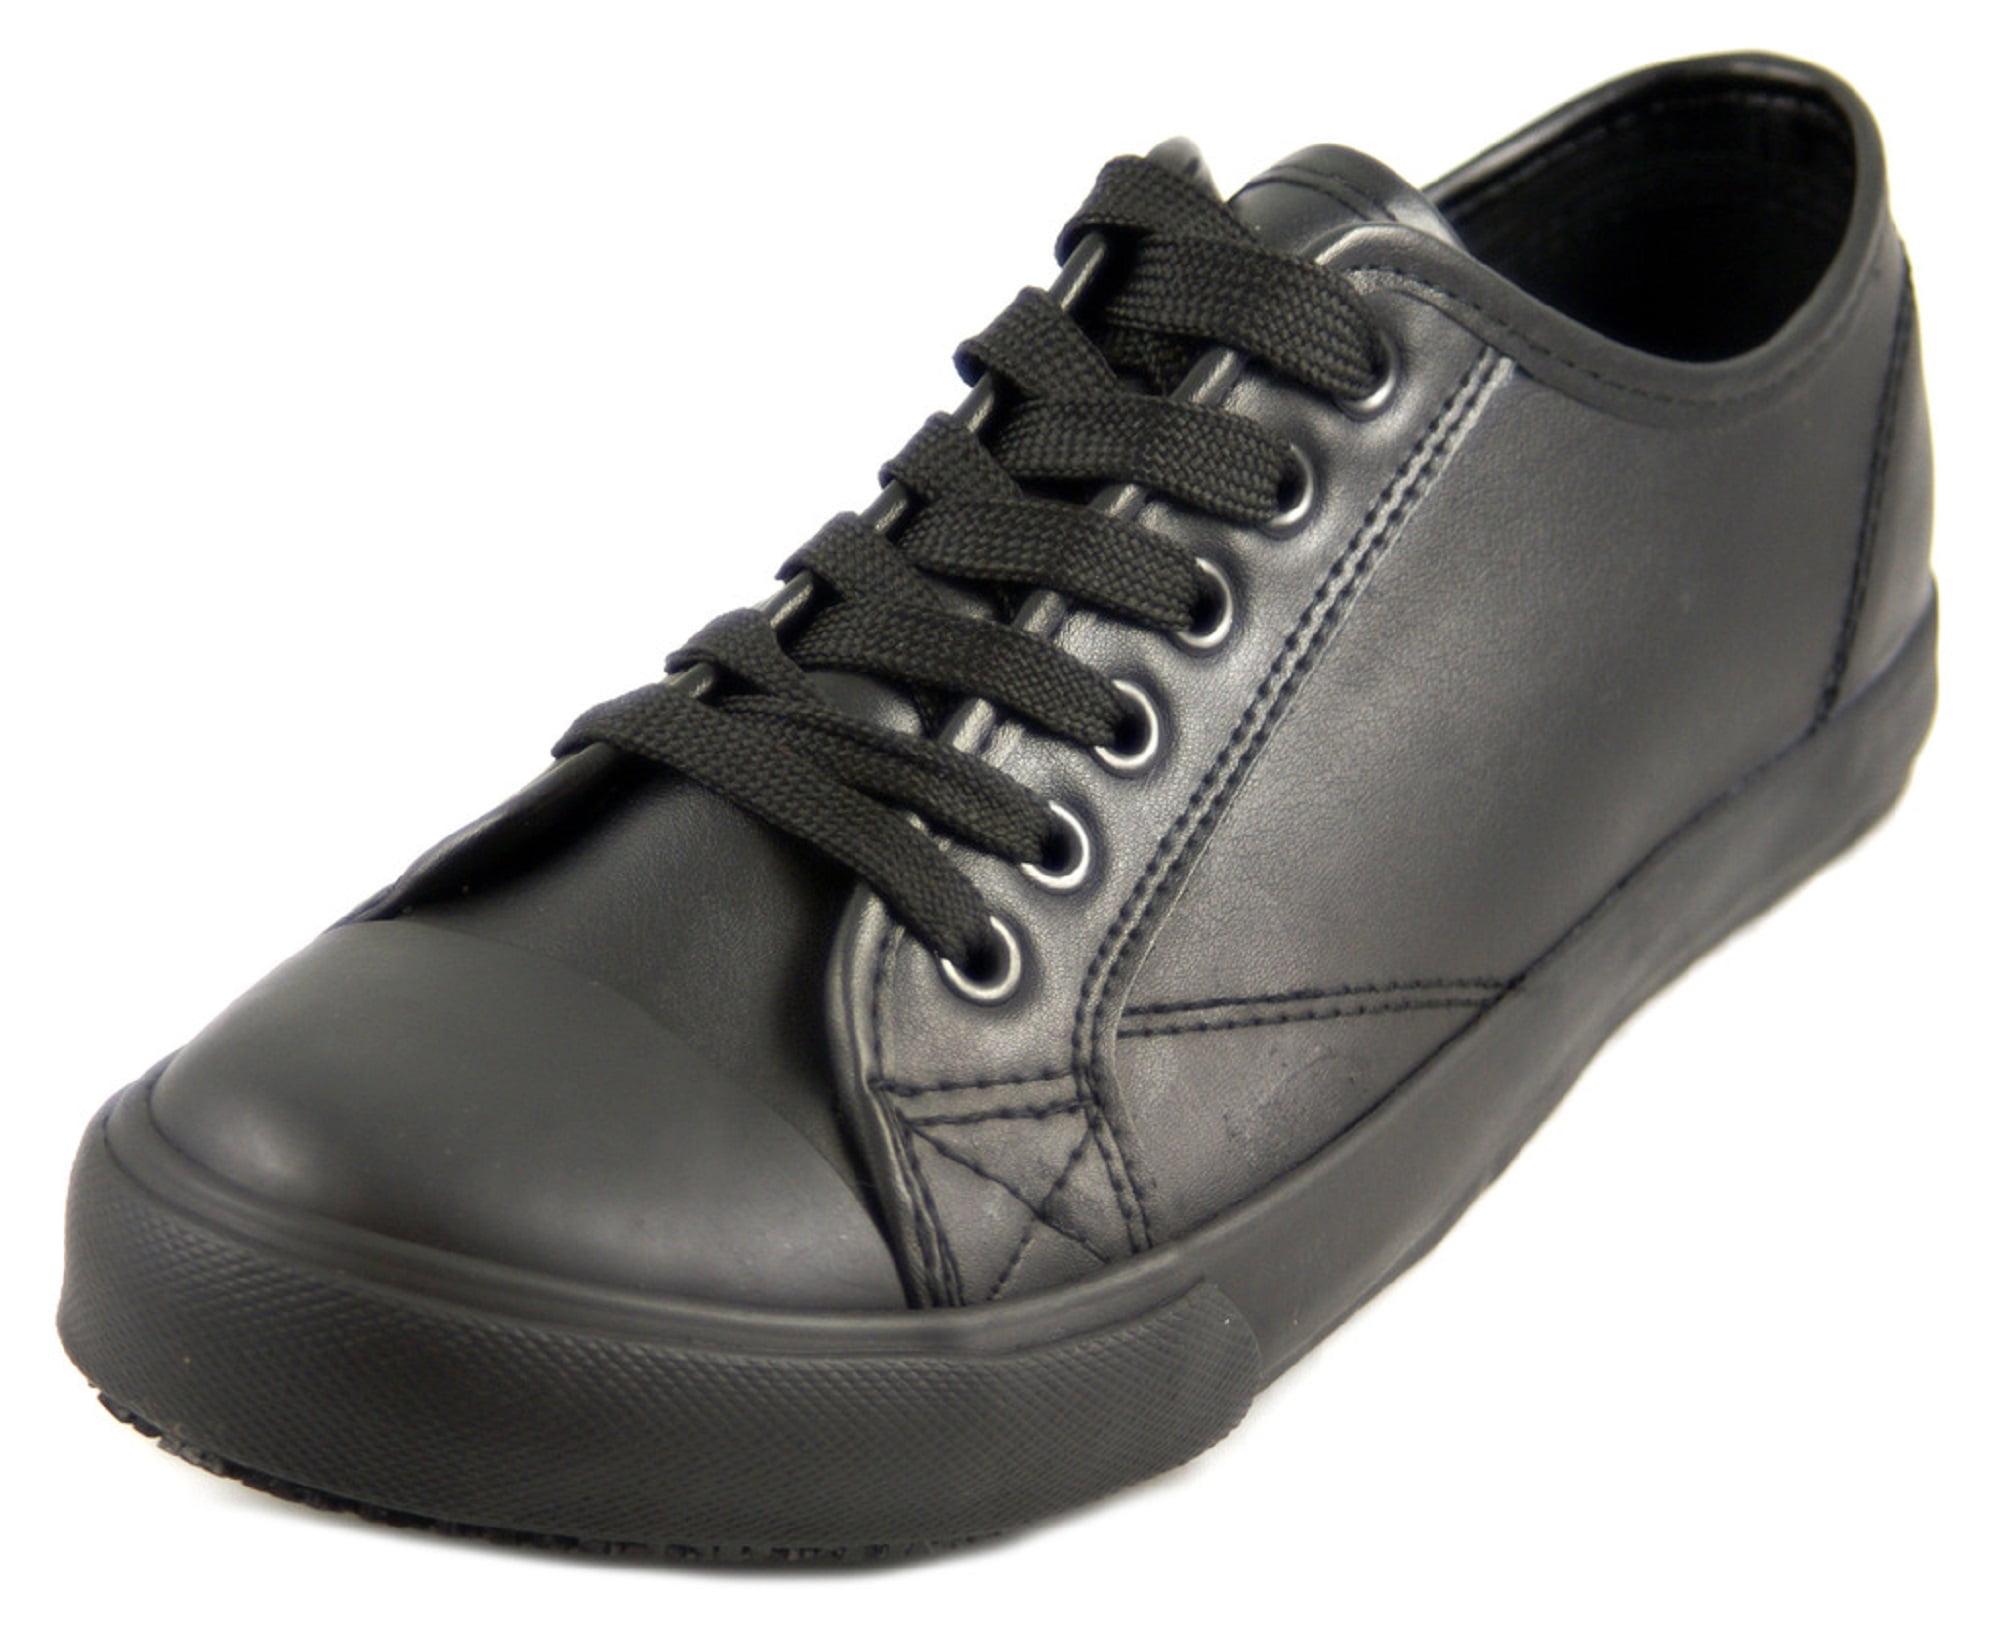 OwnShoe Women's Slip and Oil Resistant